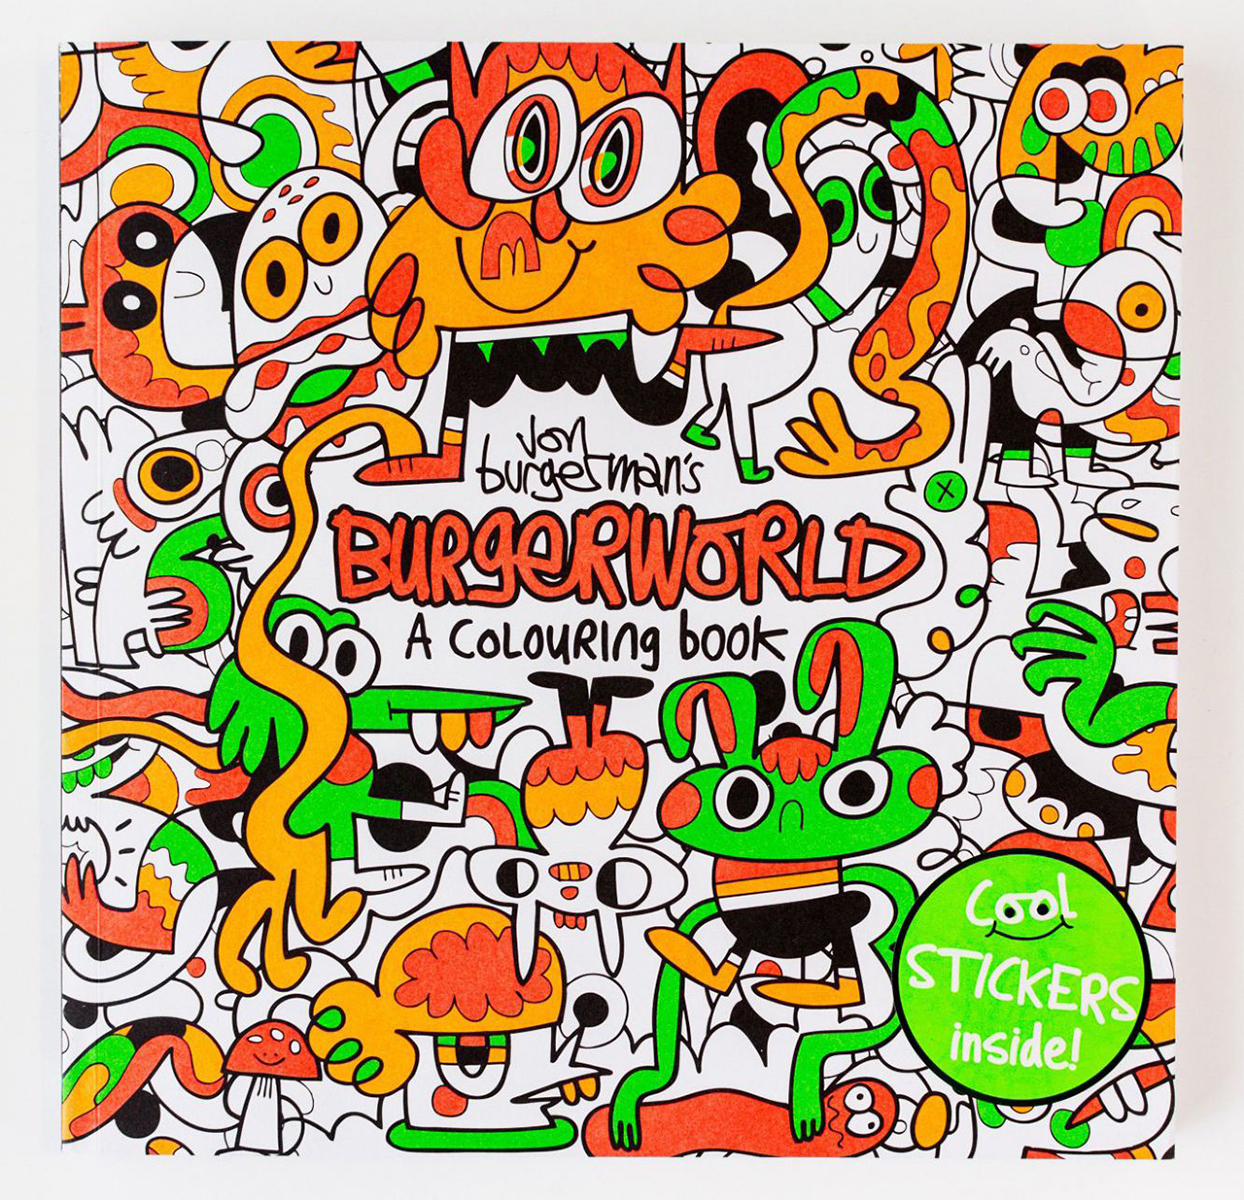 Burgerworld Coloring Book.jpg